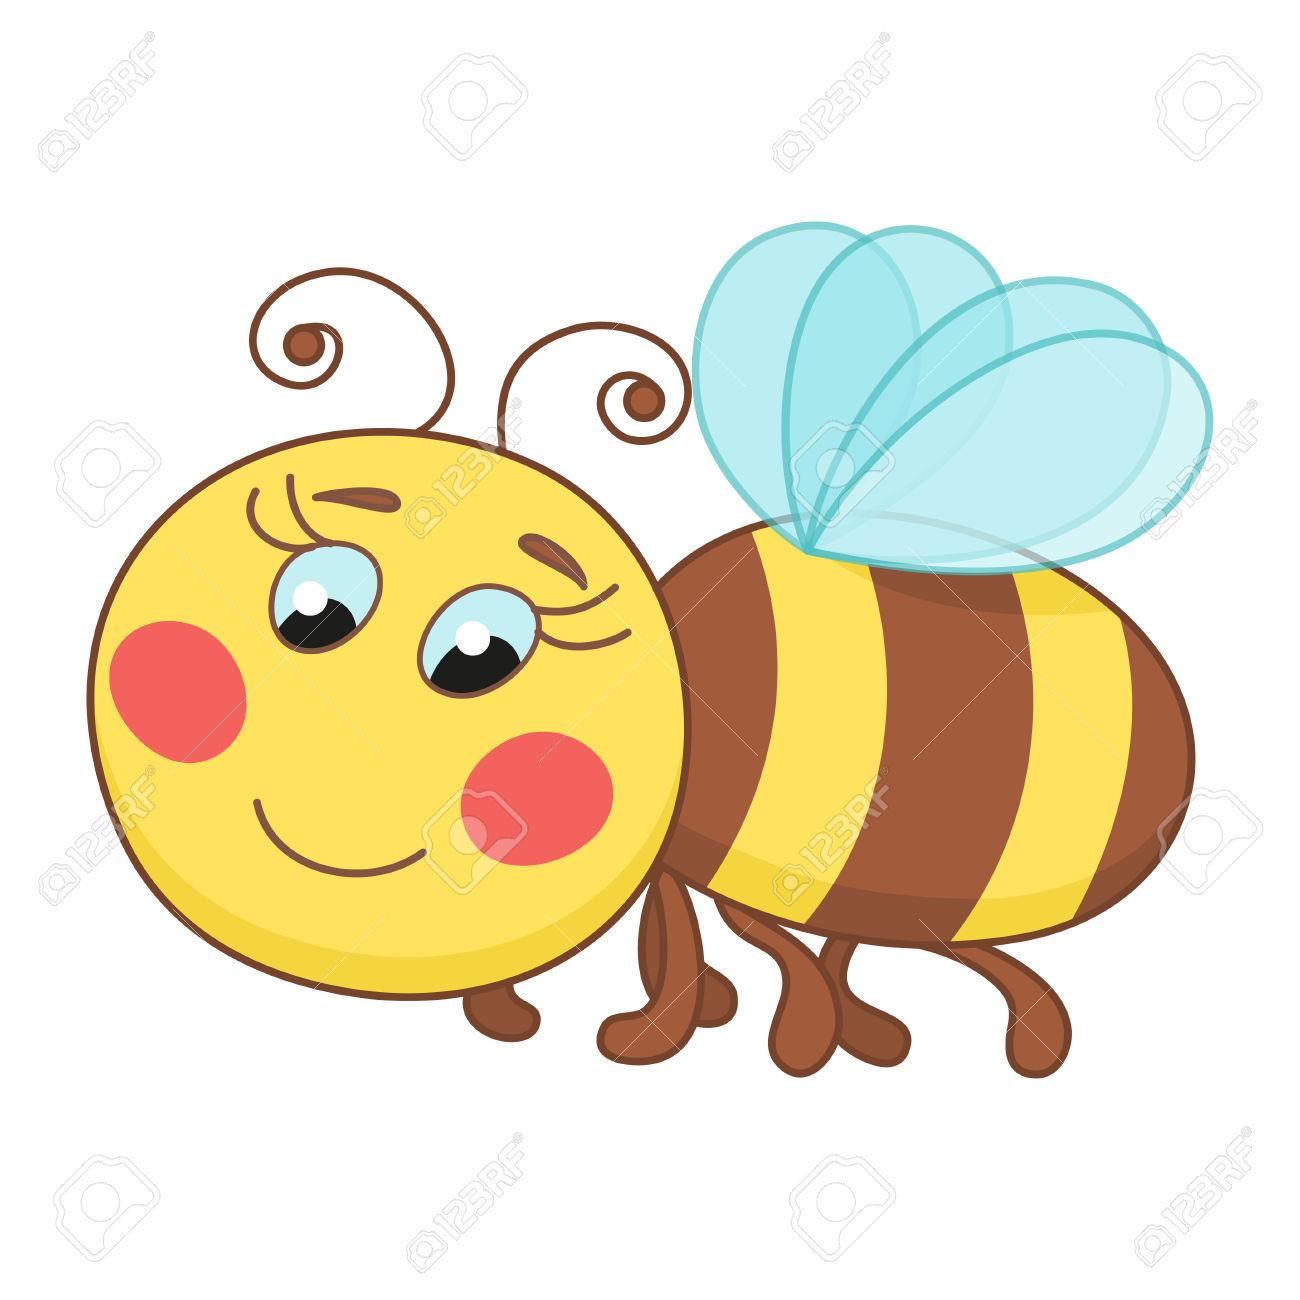 Cute Cartoon Bee, Funny Ruddy Bee Flying Royalty Free Cliparts.